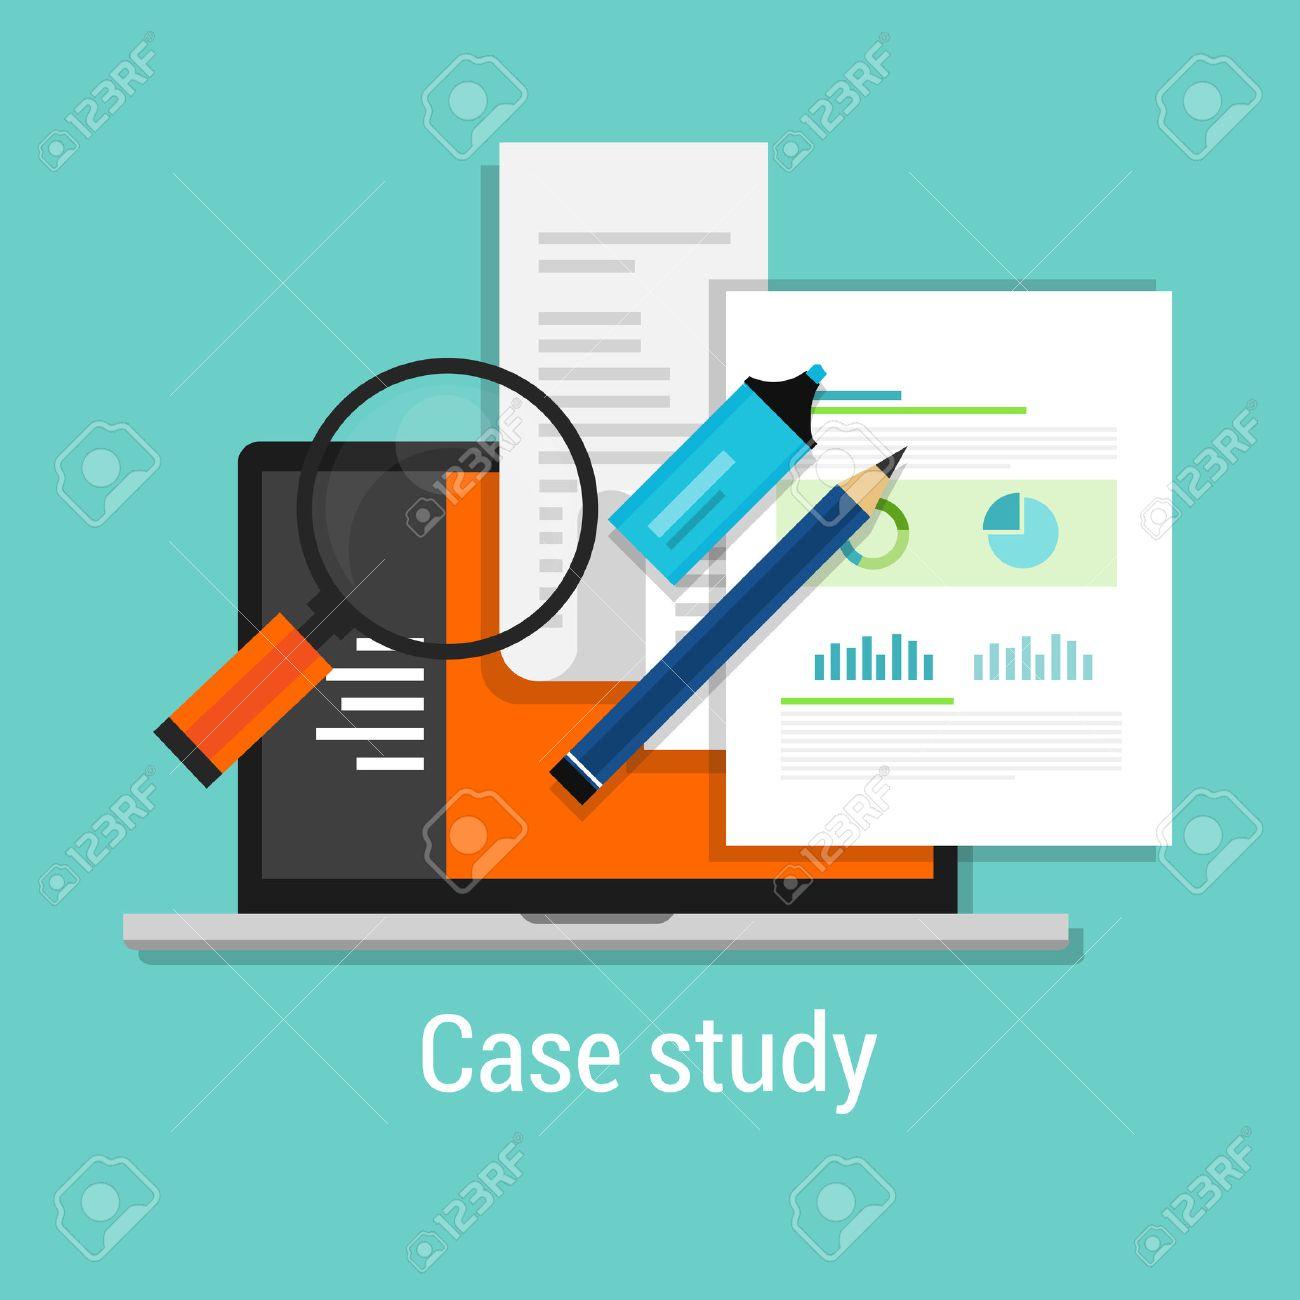 case study studies icon flat laptop magnifier learn analysis - 42754428